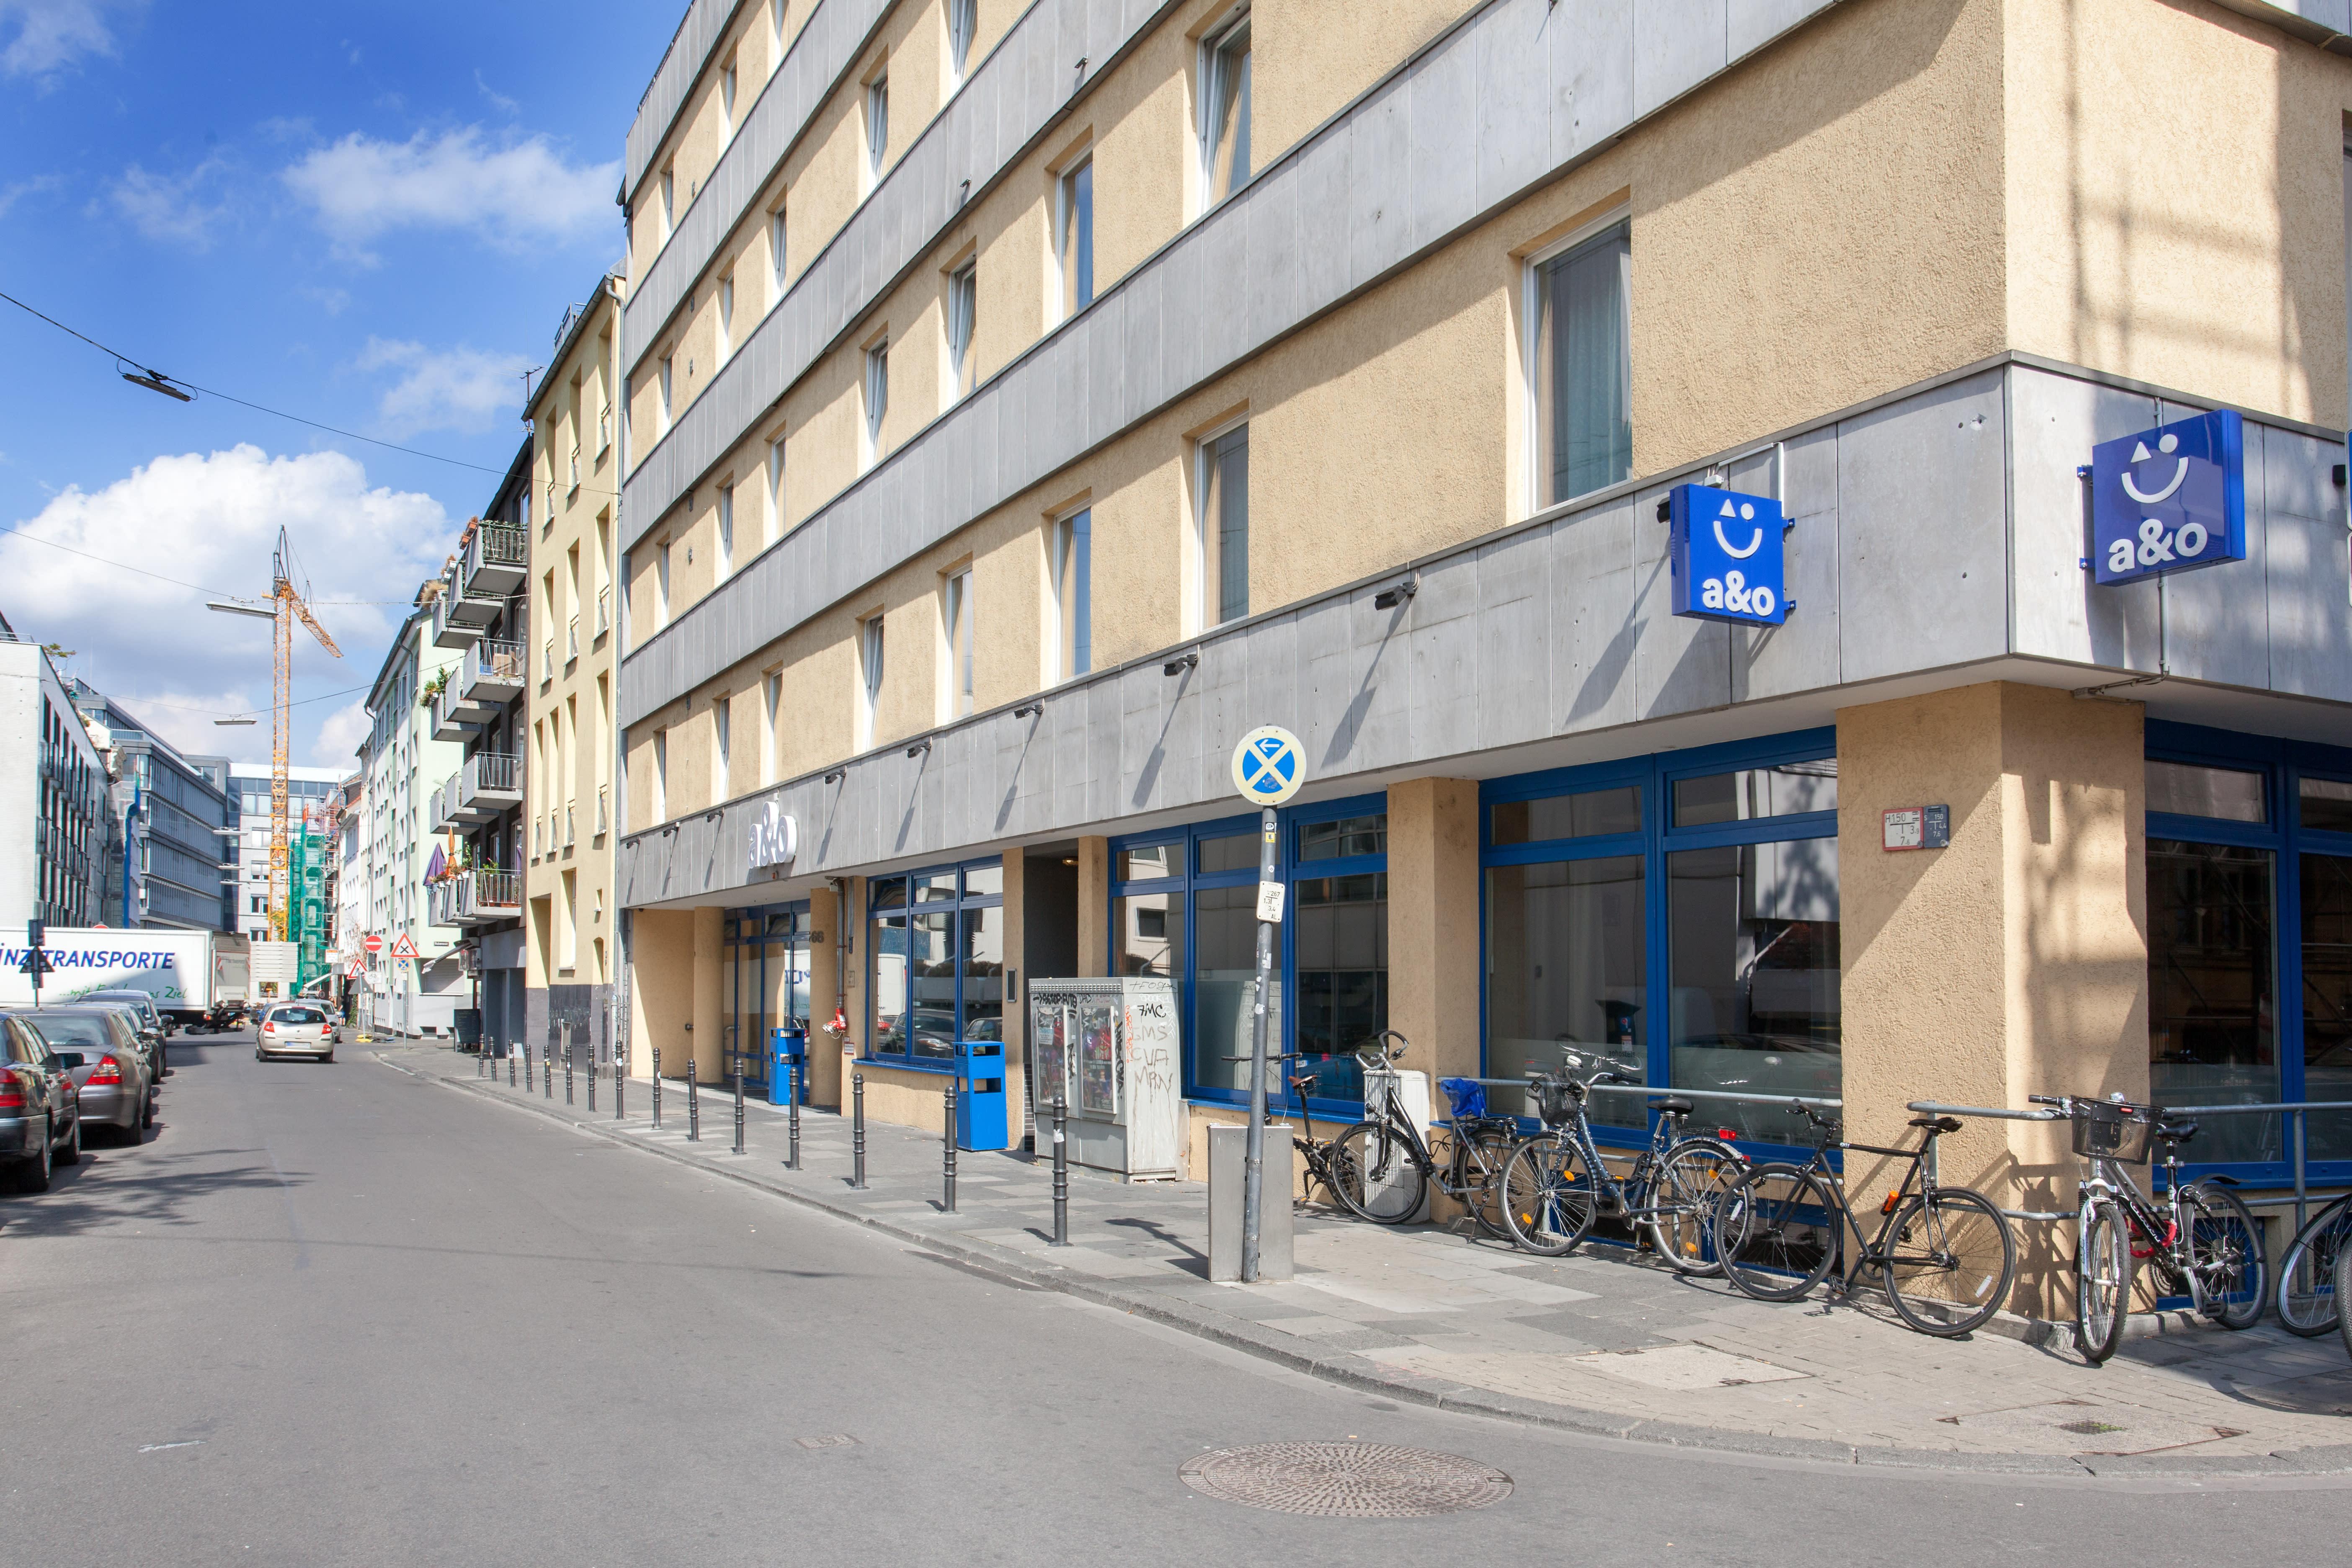 HOSTEL - a&o Köln Neumarkt